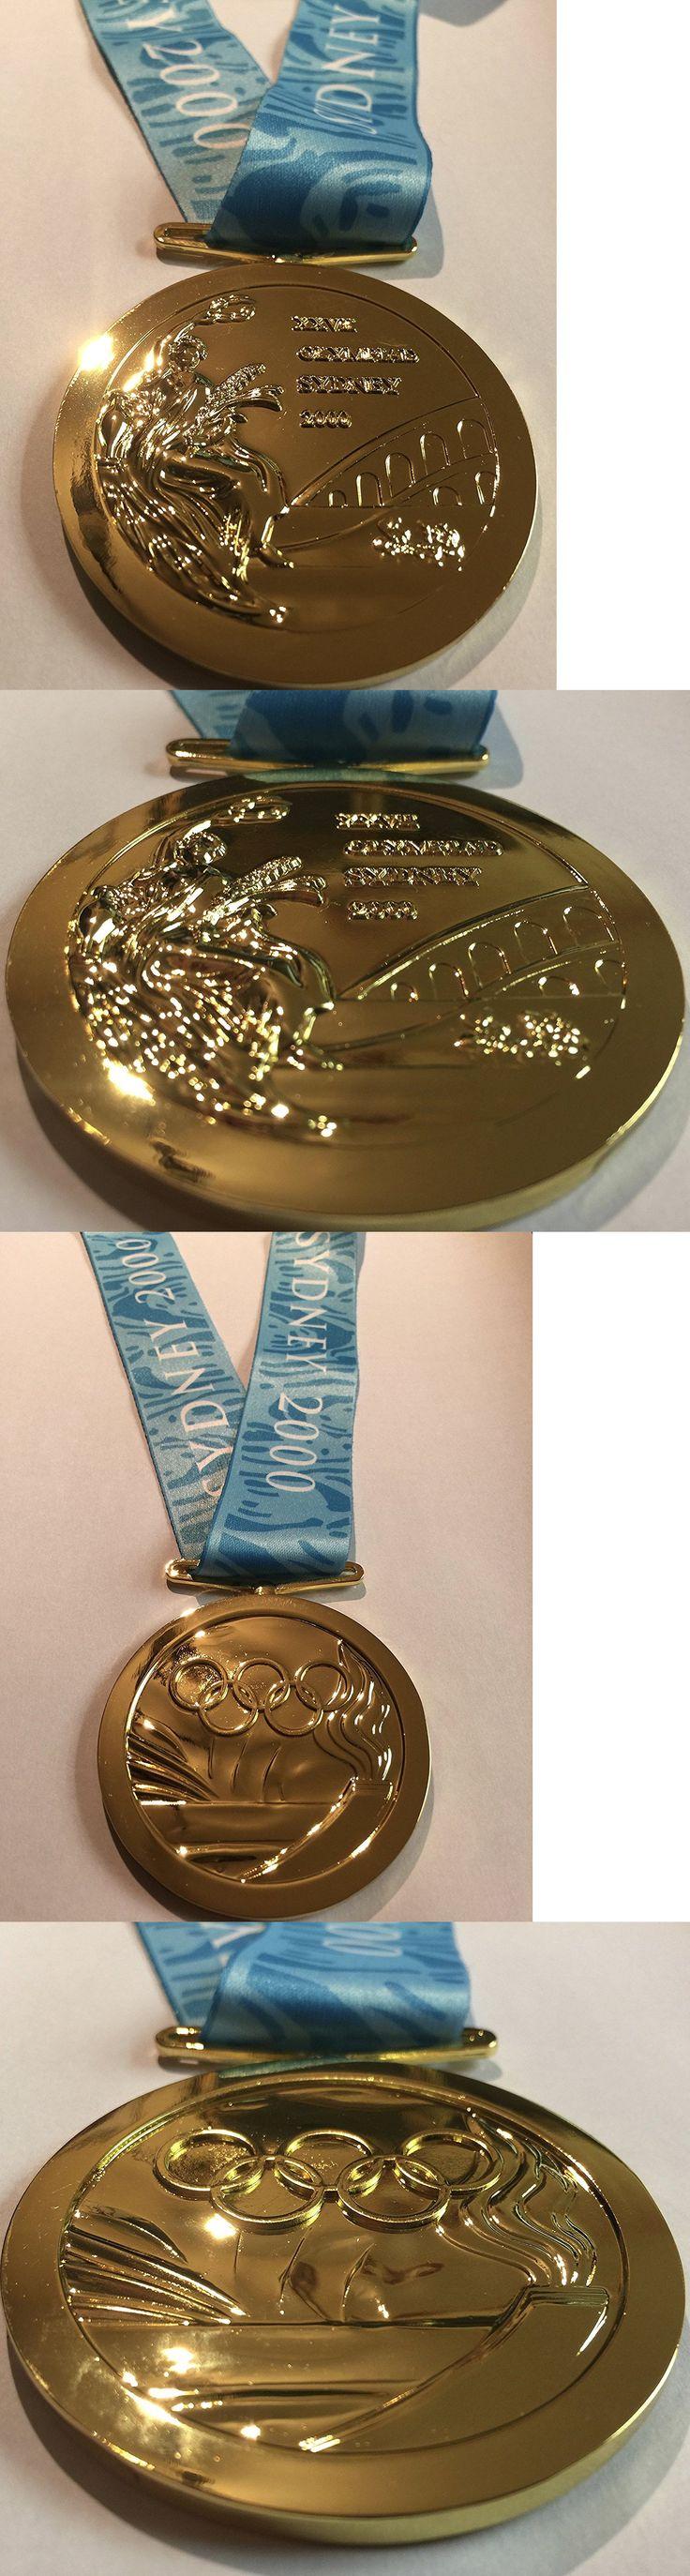 Olympics 27291: 2000 Sydney Australia Olympic Souvenir Gold Medal Rare Team Usa 1:1 Full Size -> BUY IT NOW ONLY: $49.95 on eBay!